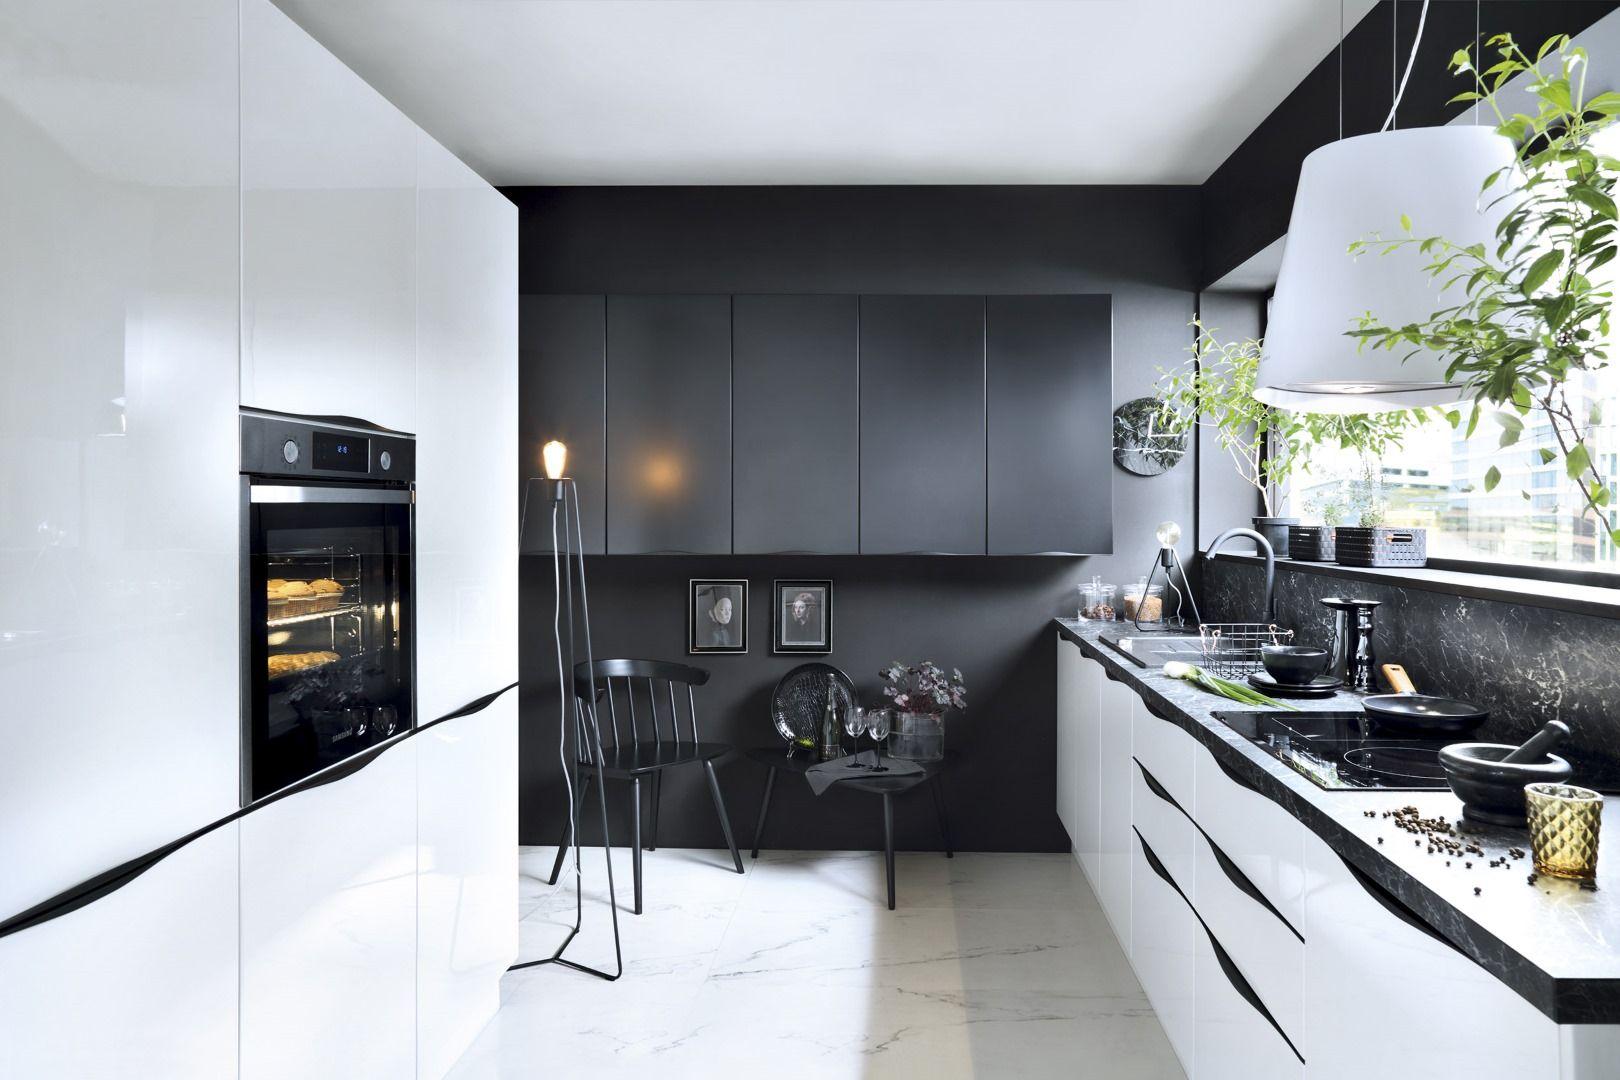 Inspiracje Pomysly I Aranzacje W Aranzacji Senso Kitchens Capital 33rd Saperavi Avenue Black Red White Kitchen Cabinets Kitchen Decor